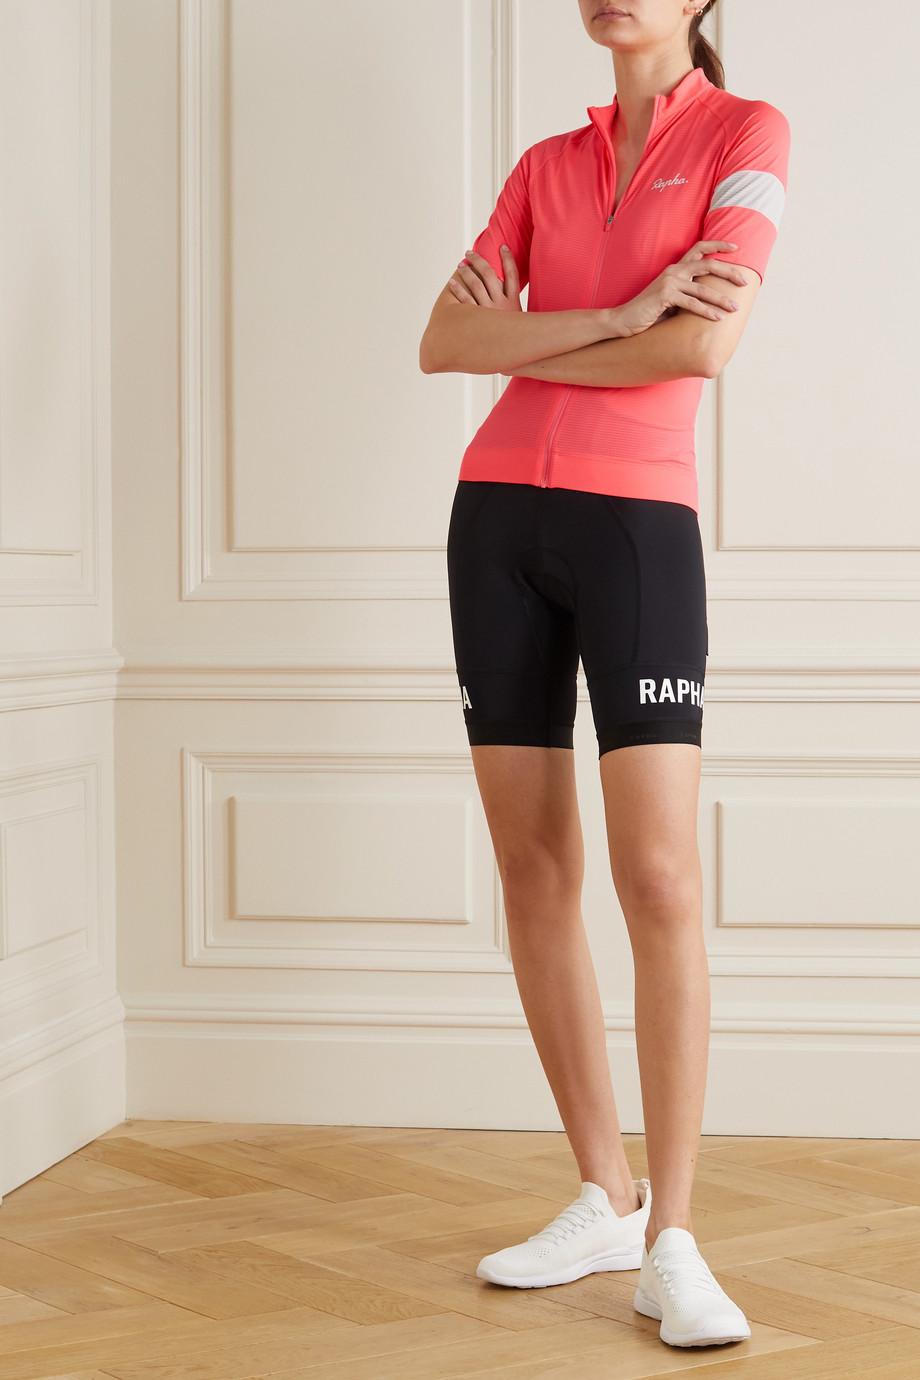 Rapha Pro Team Training mesh-paneled recycled stretch bib shorts